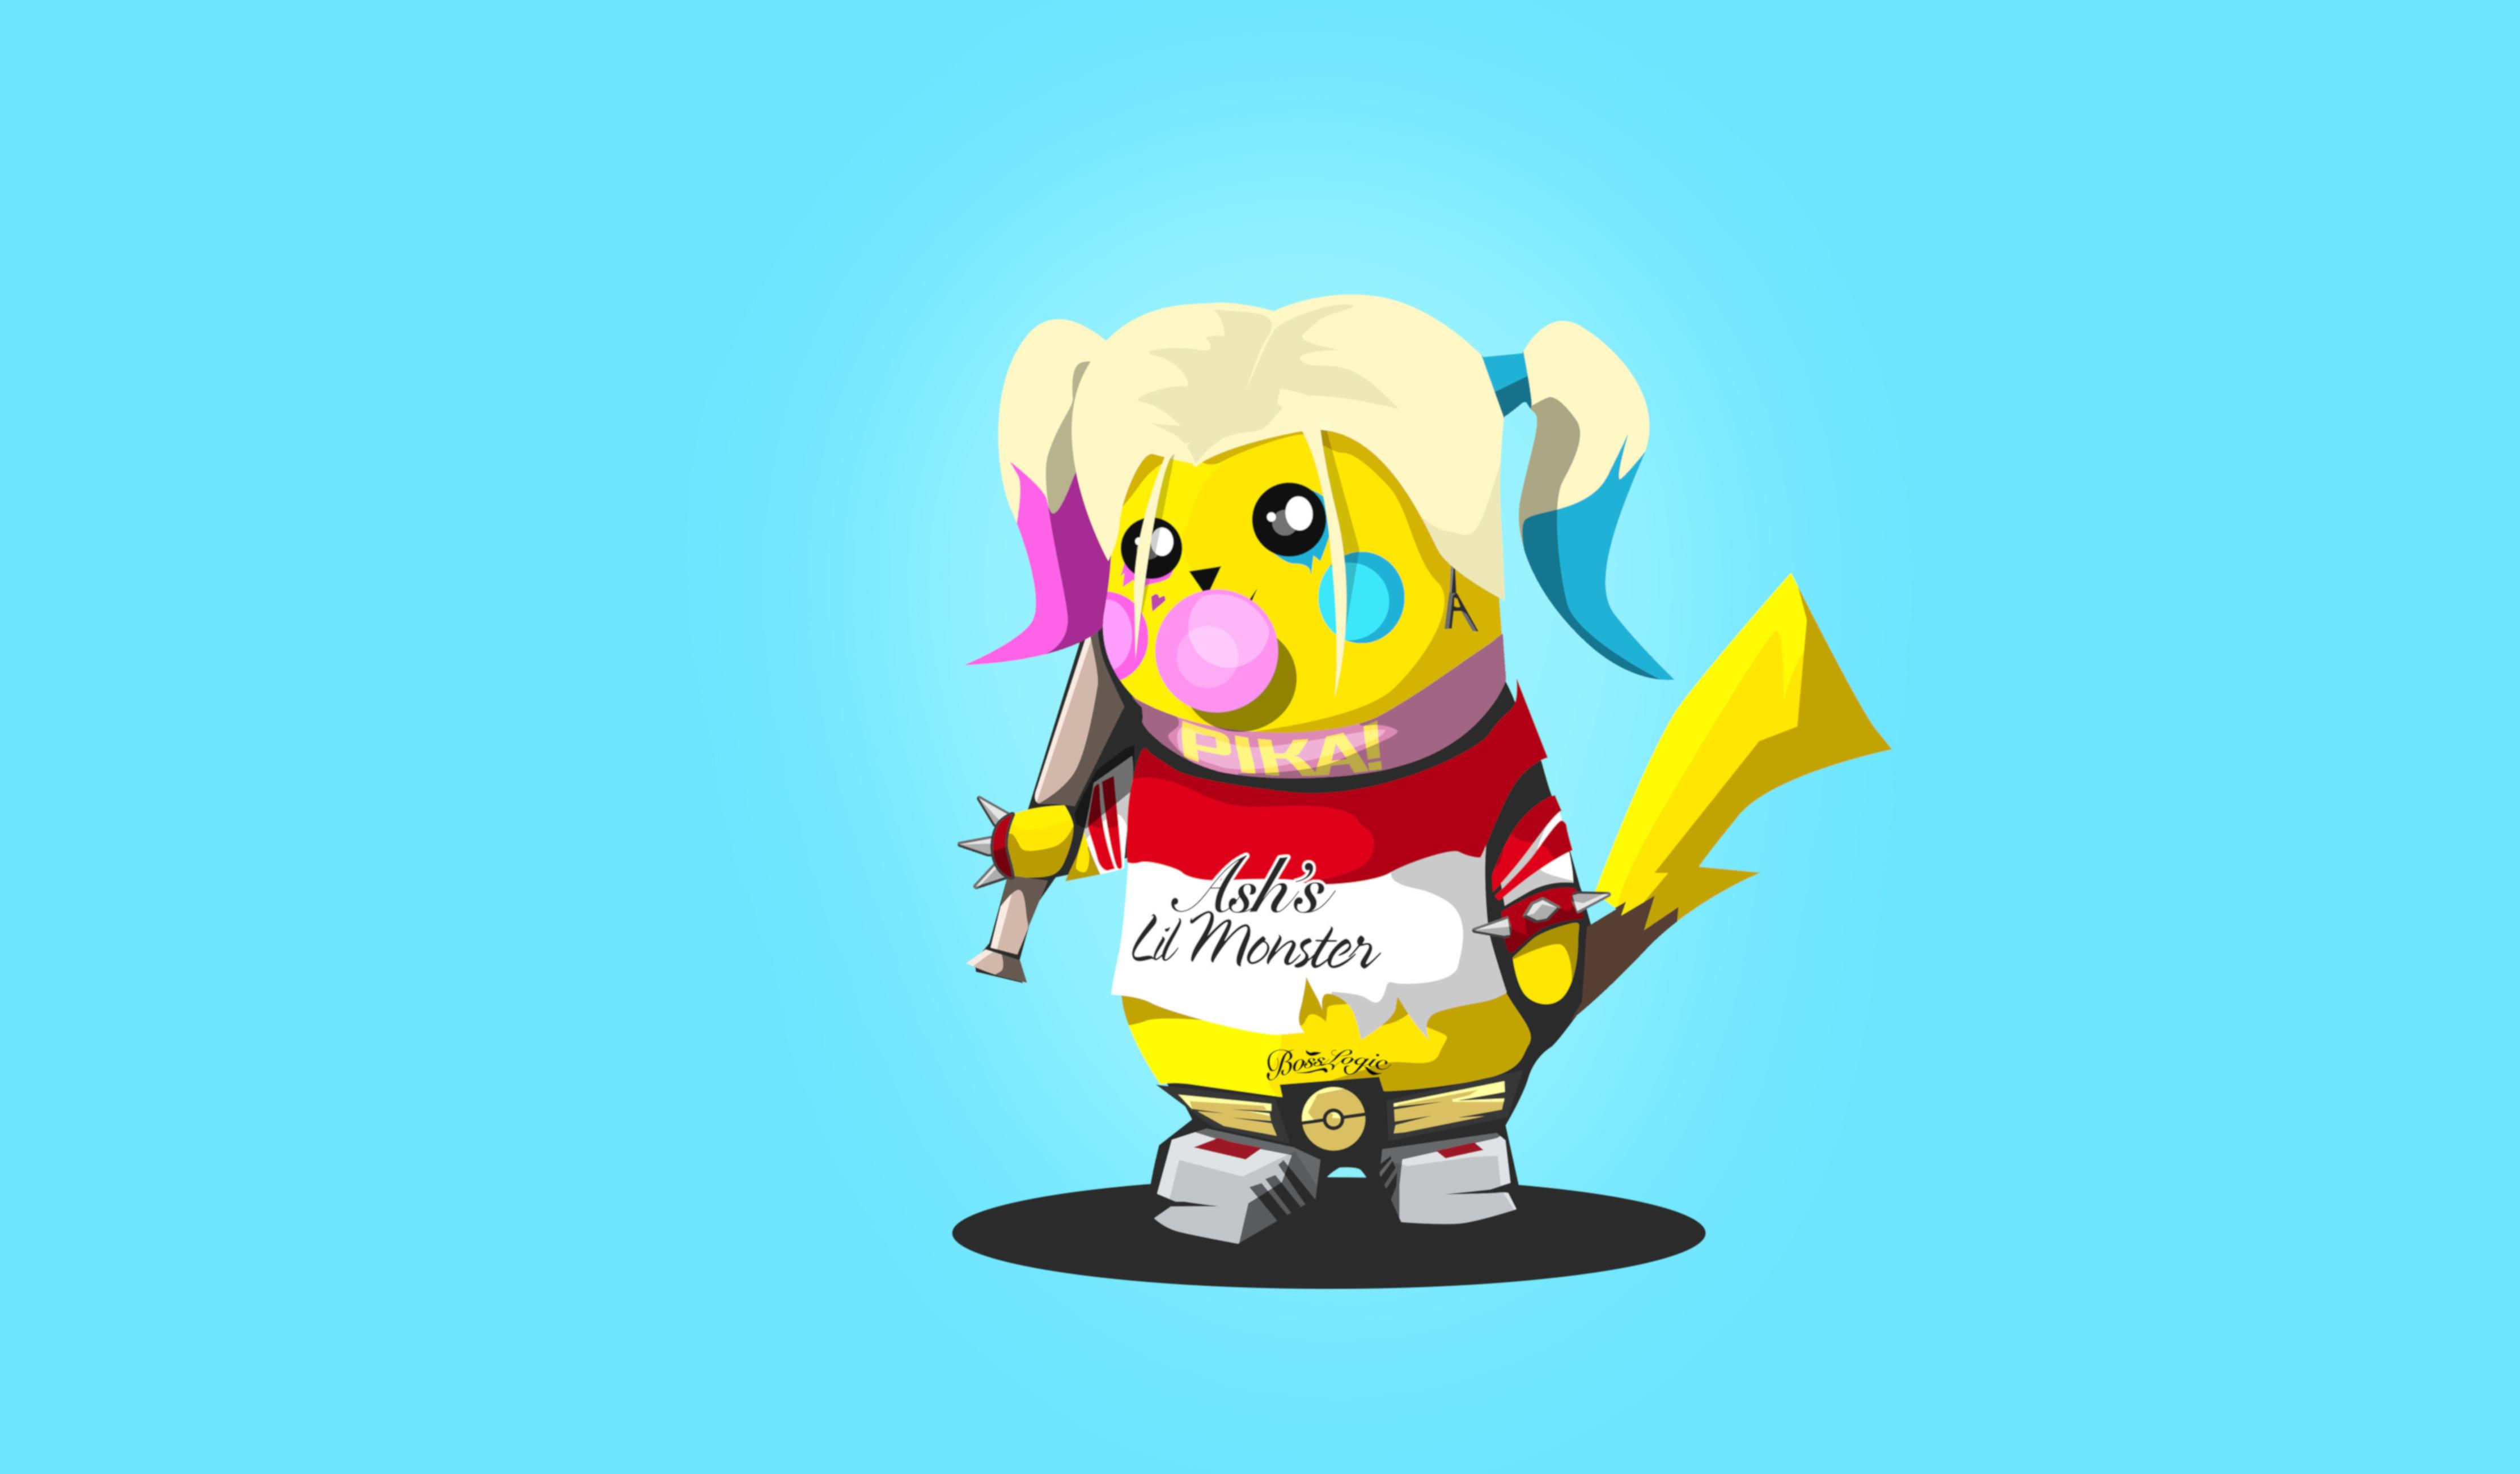 Pikachu 4k Ultra HD Wallpaper | Background Image | 4445x2600 | ID:942055 - Wallpaper Abyss